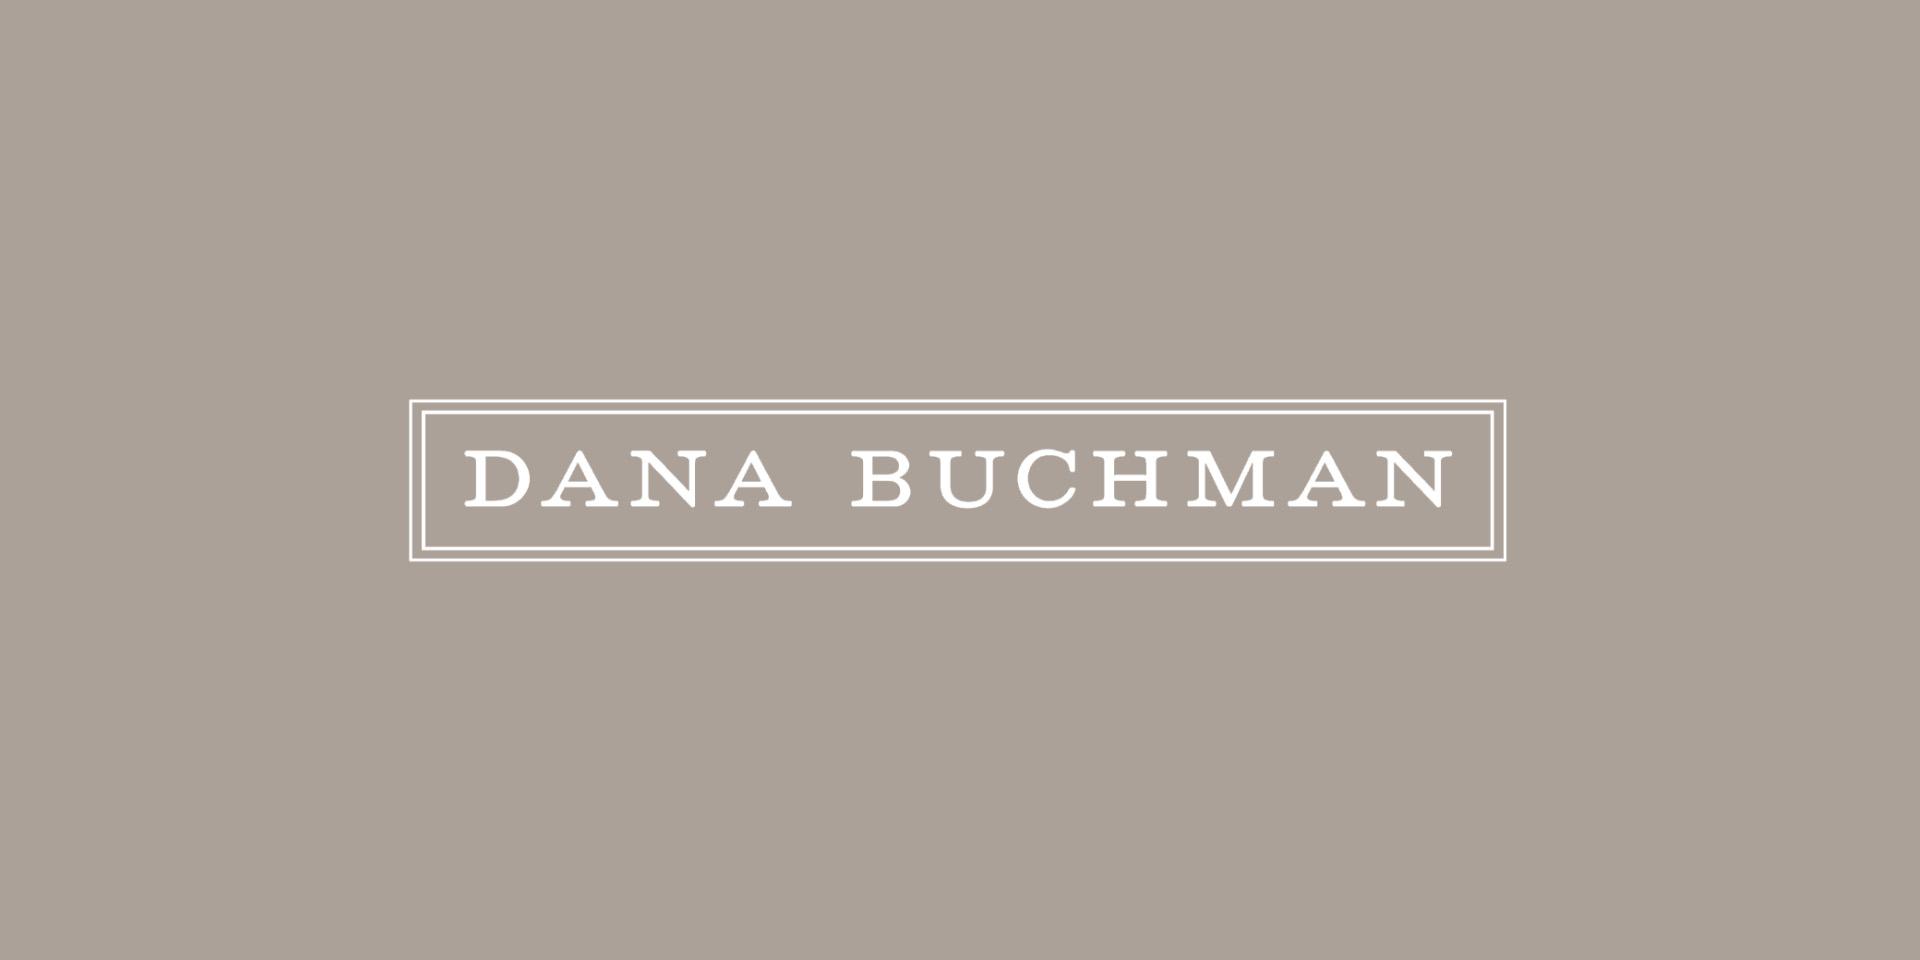 Brand logo of Dana Buchman